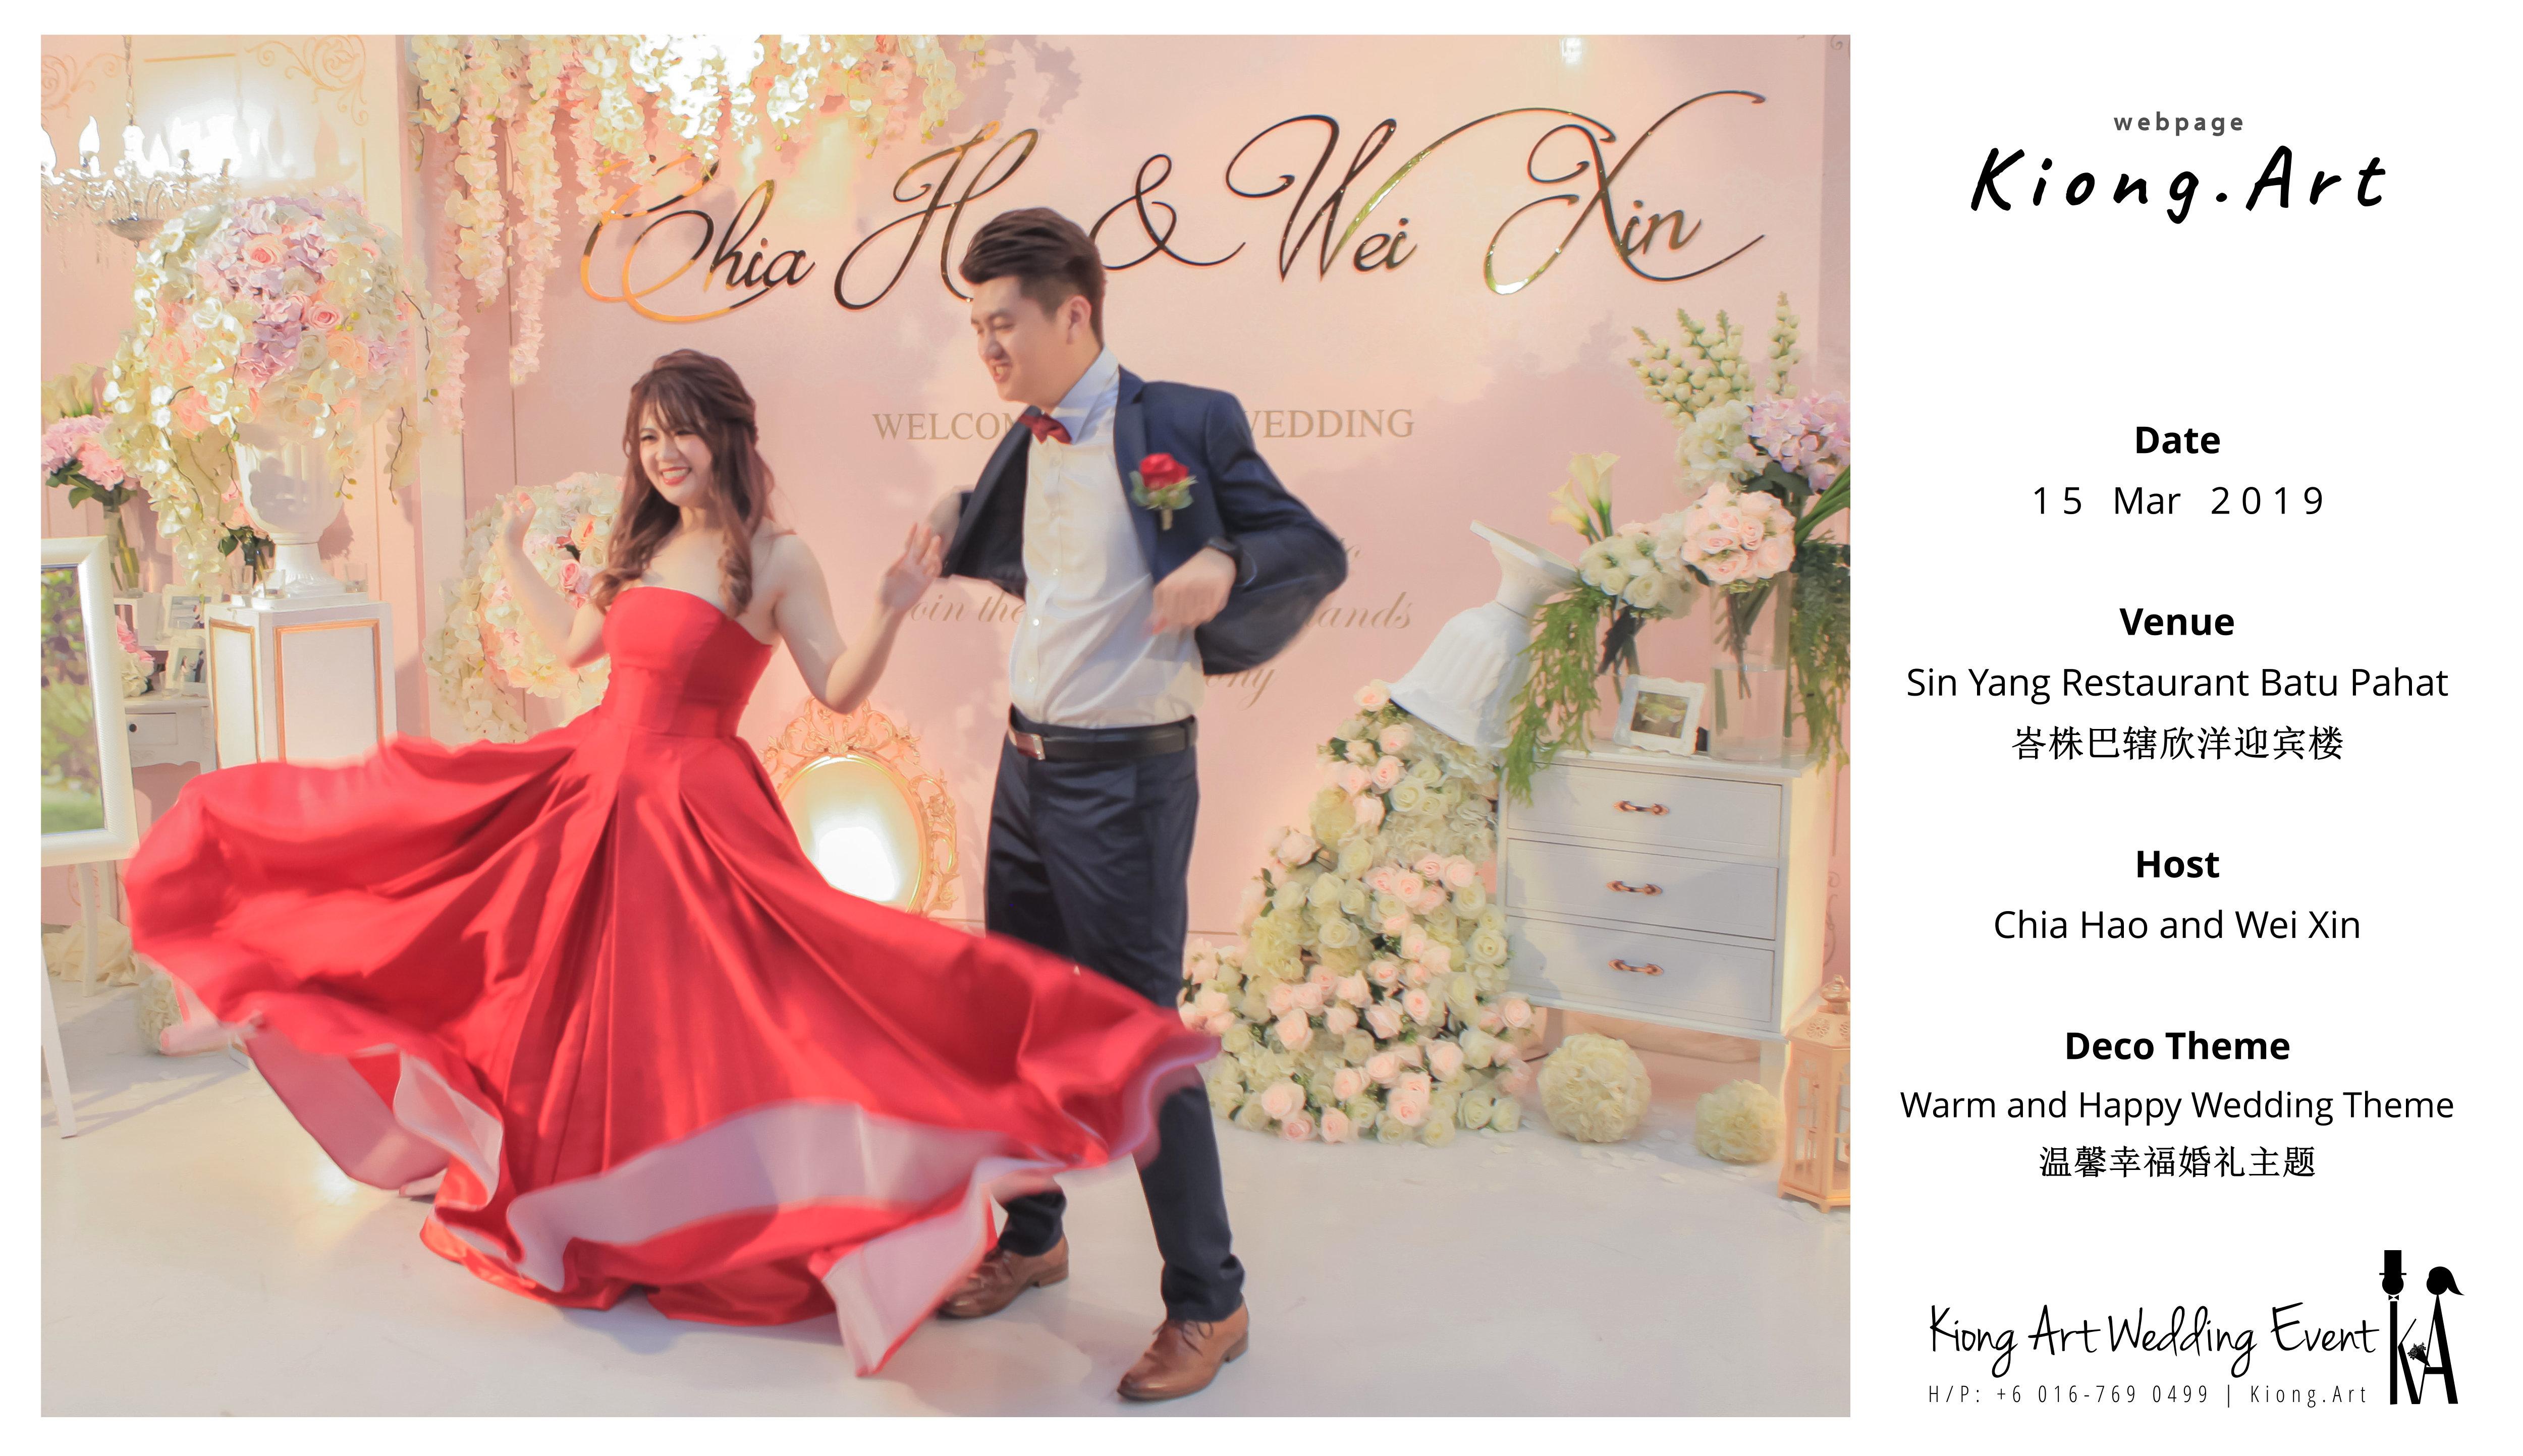 Malaysia Wed Kuala Lumpur Wedding Deco Decoration Kiong Art Wedding Deco Warm and Happy Wedding Theme Chia Hao and Wei Xin Sin Yang Restaurant Batu Pahat A15-A00-003